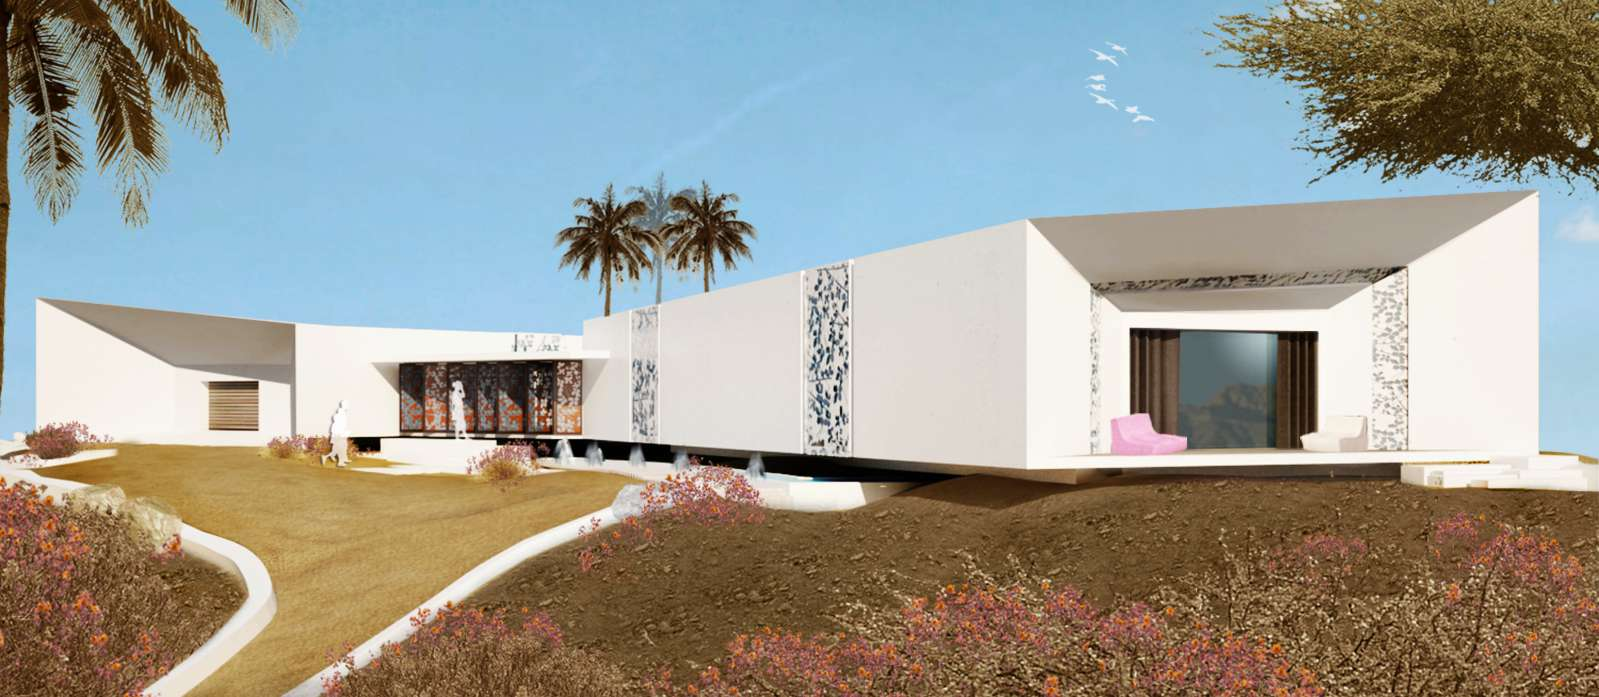 04-Alkhozama-Desert-Casa-de-Ark-Kassam-Arquitectos